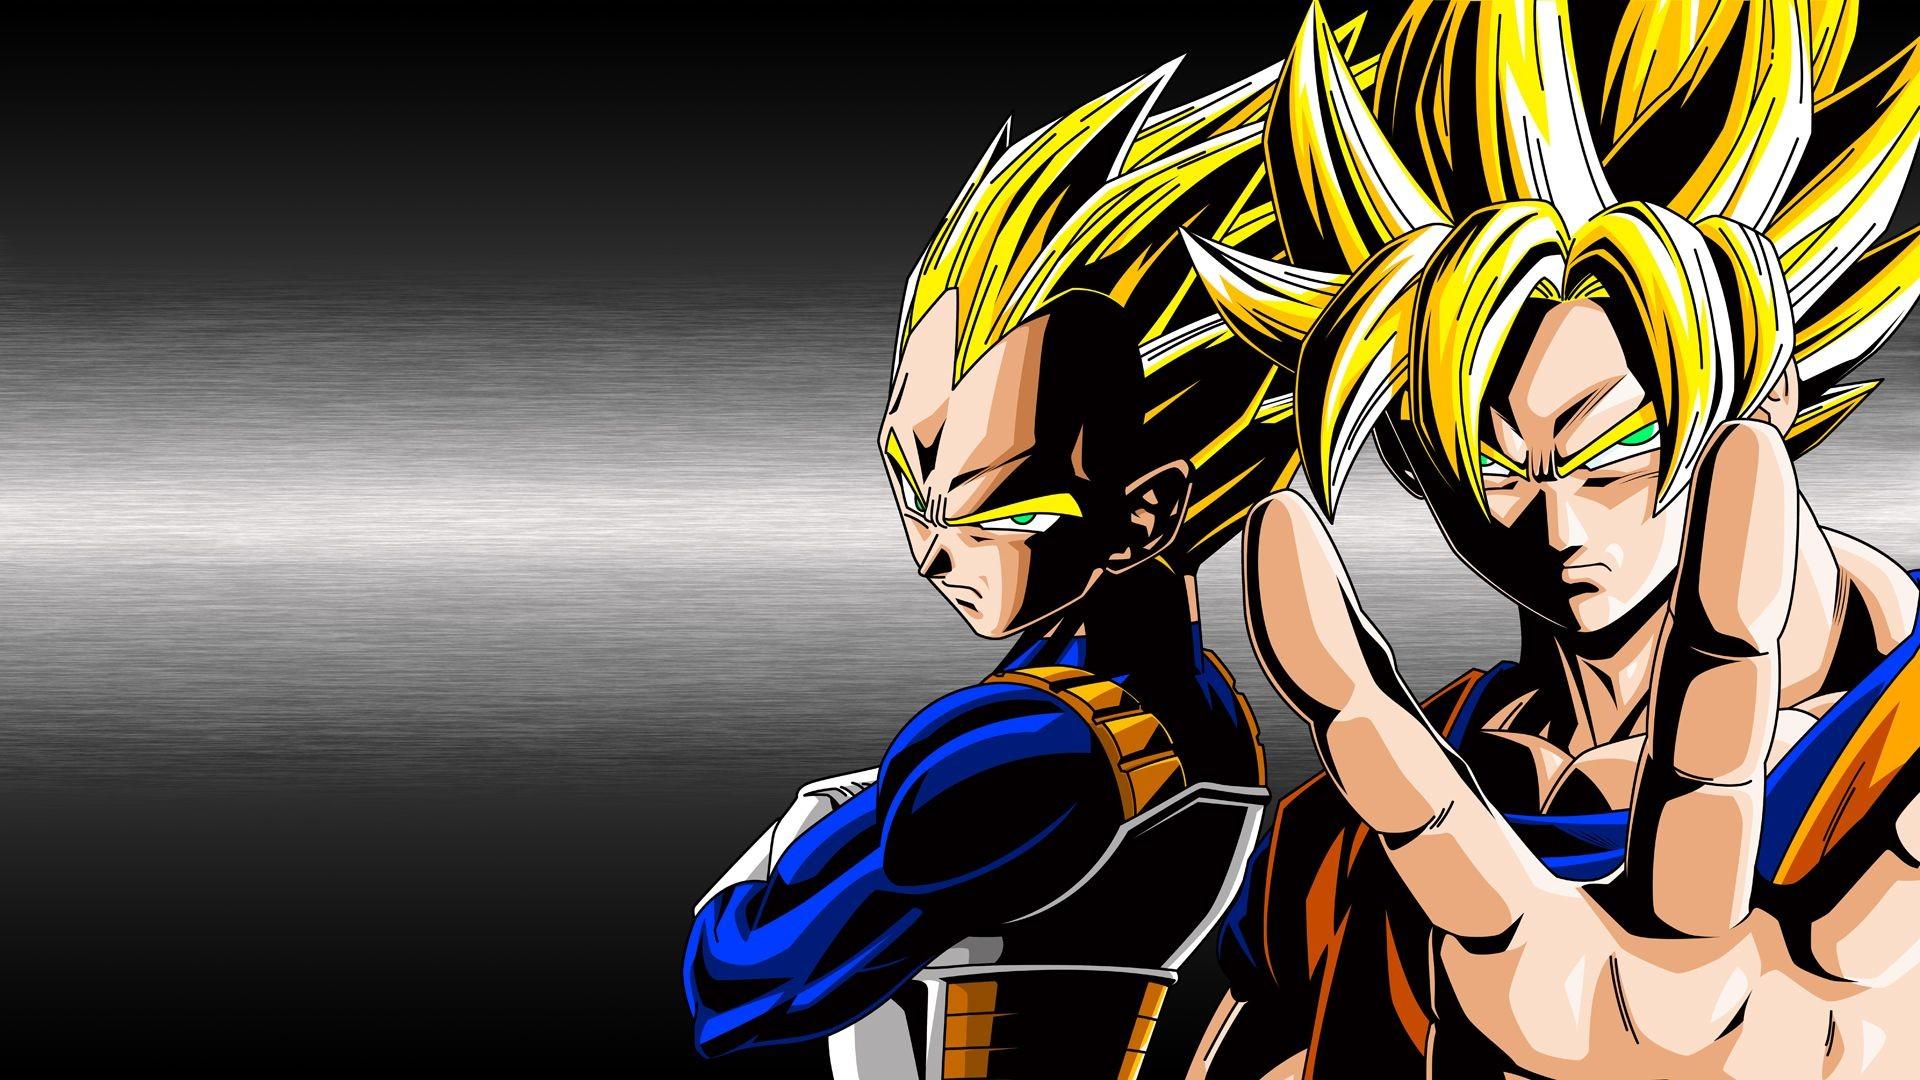 1920x1080 Goku And Vegeta Super Saiyan God Fusion